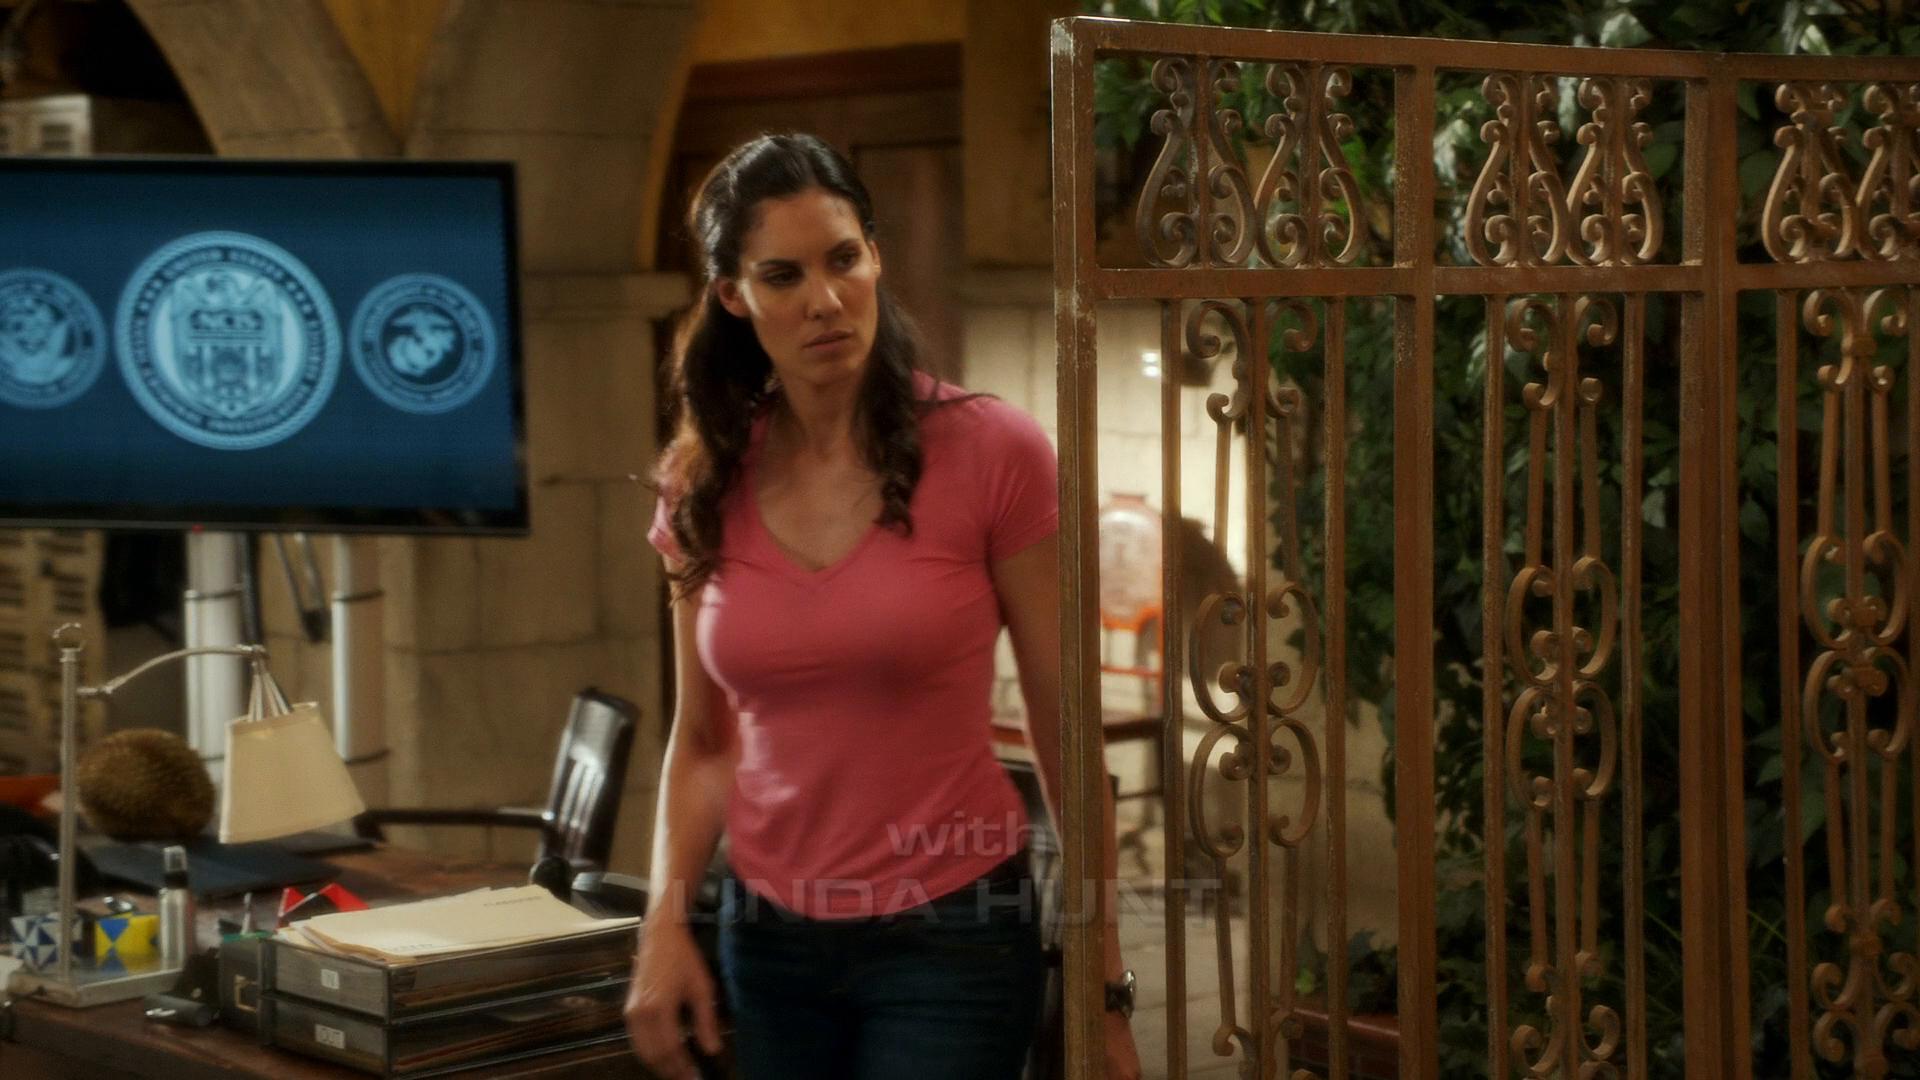 NCIS Los Angeles S06E06 MULTi 1080p WEB H264-NERO